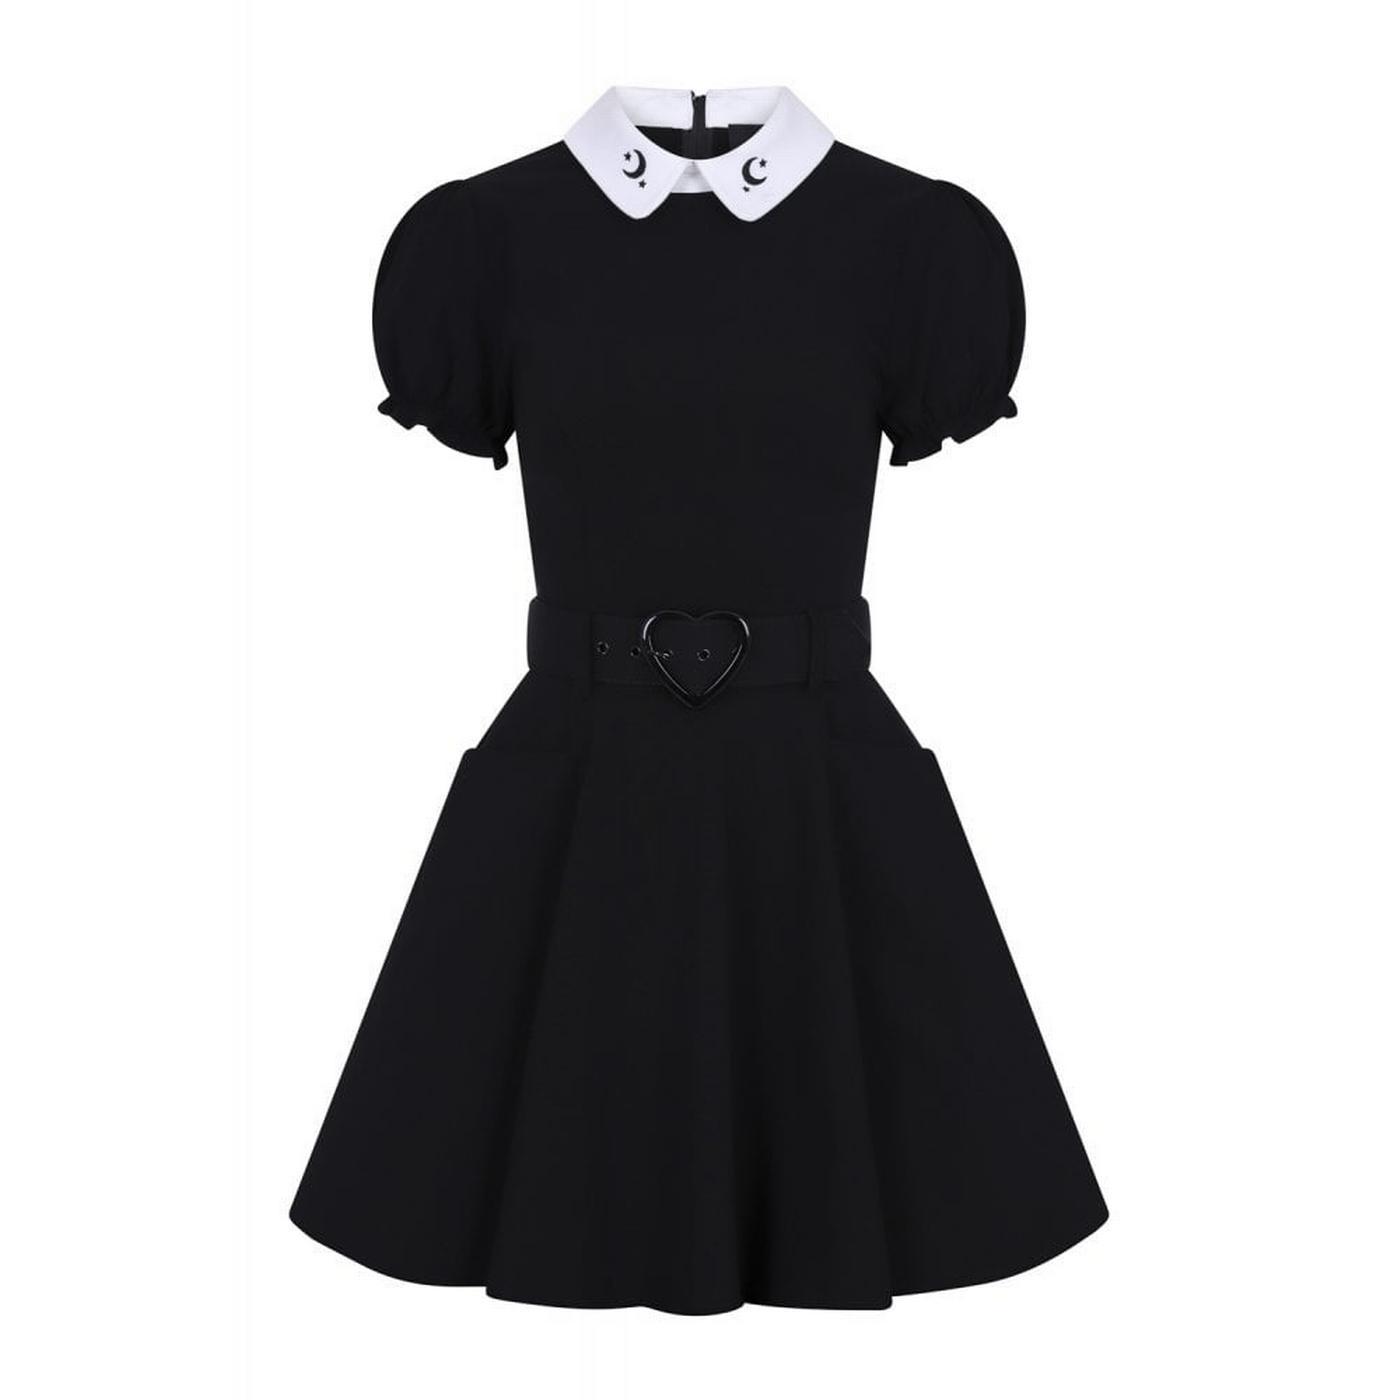 Bunny Moon COLLECTIF Vintage Doll Dress - Black